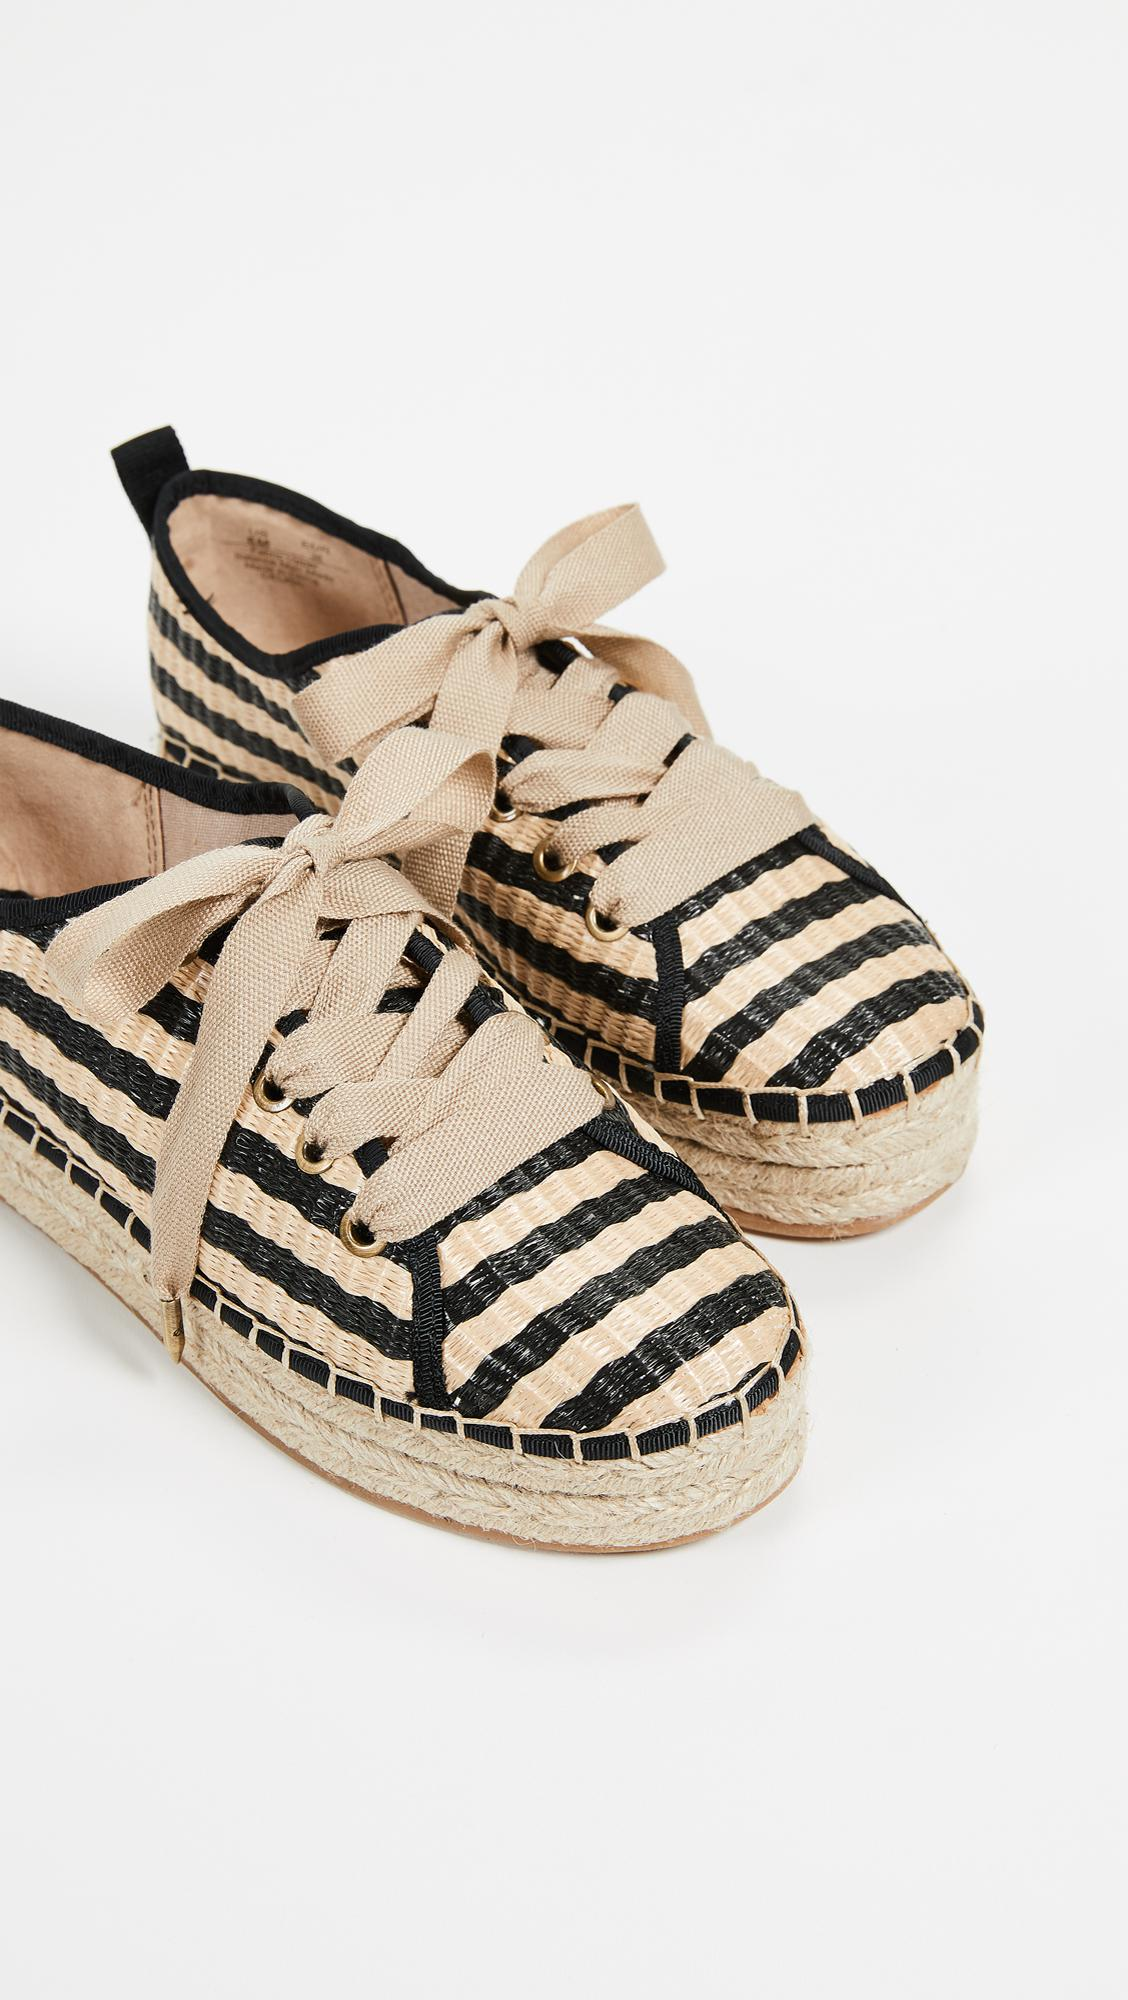 Sam Edelman Canvas Celina Espadrille Sneakers